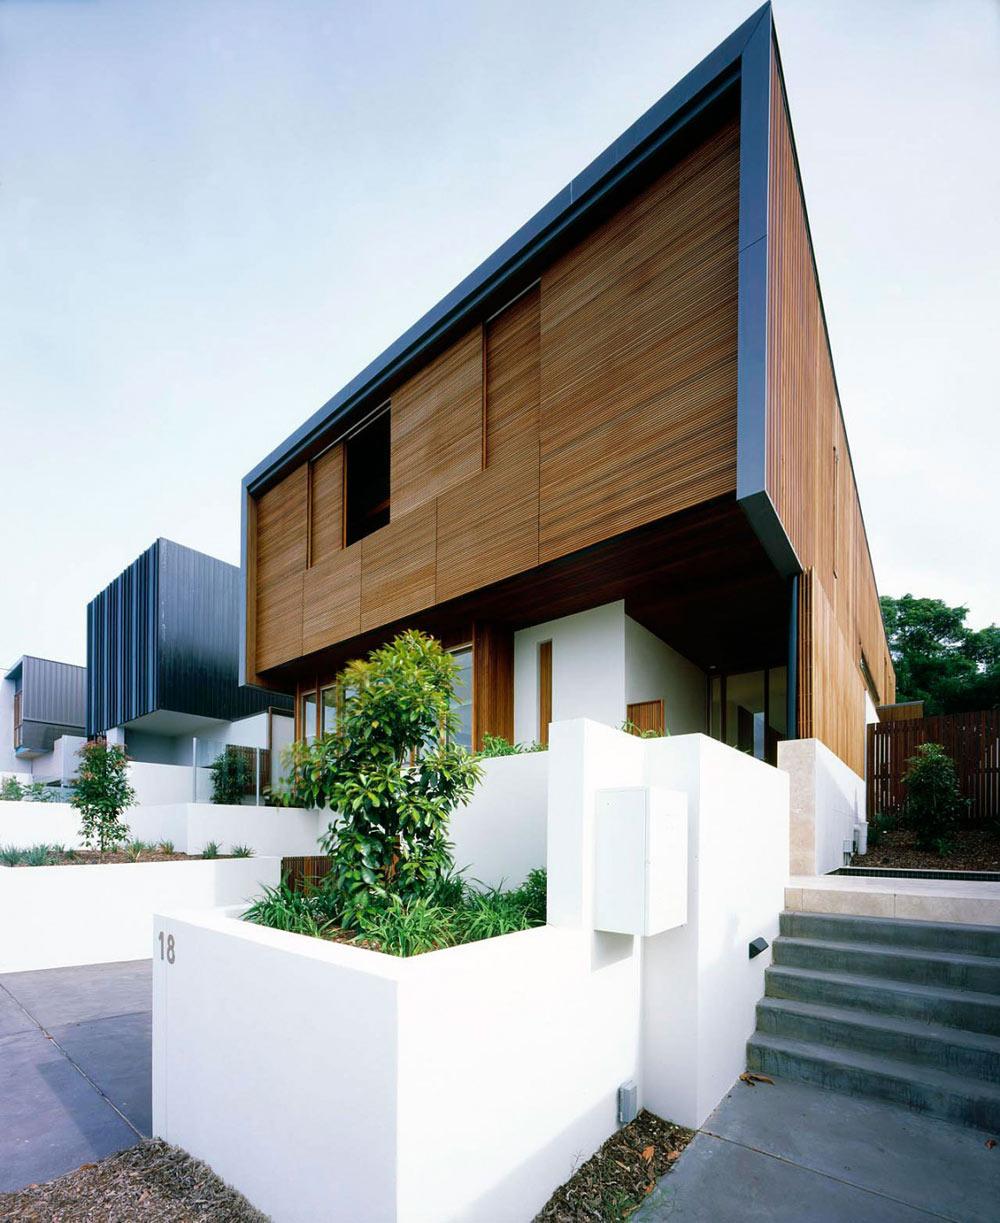 Elysium 176 by Richard Kirk Architect